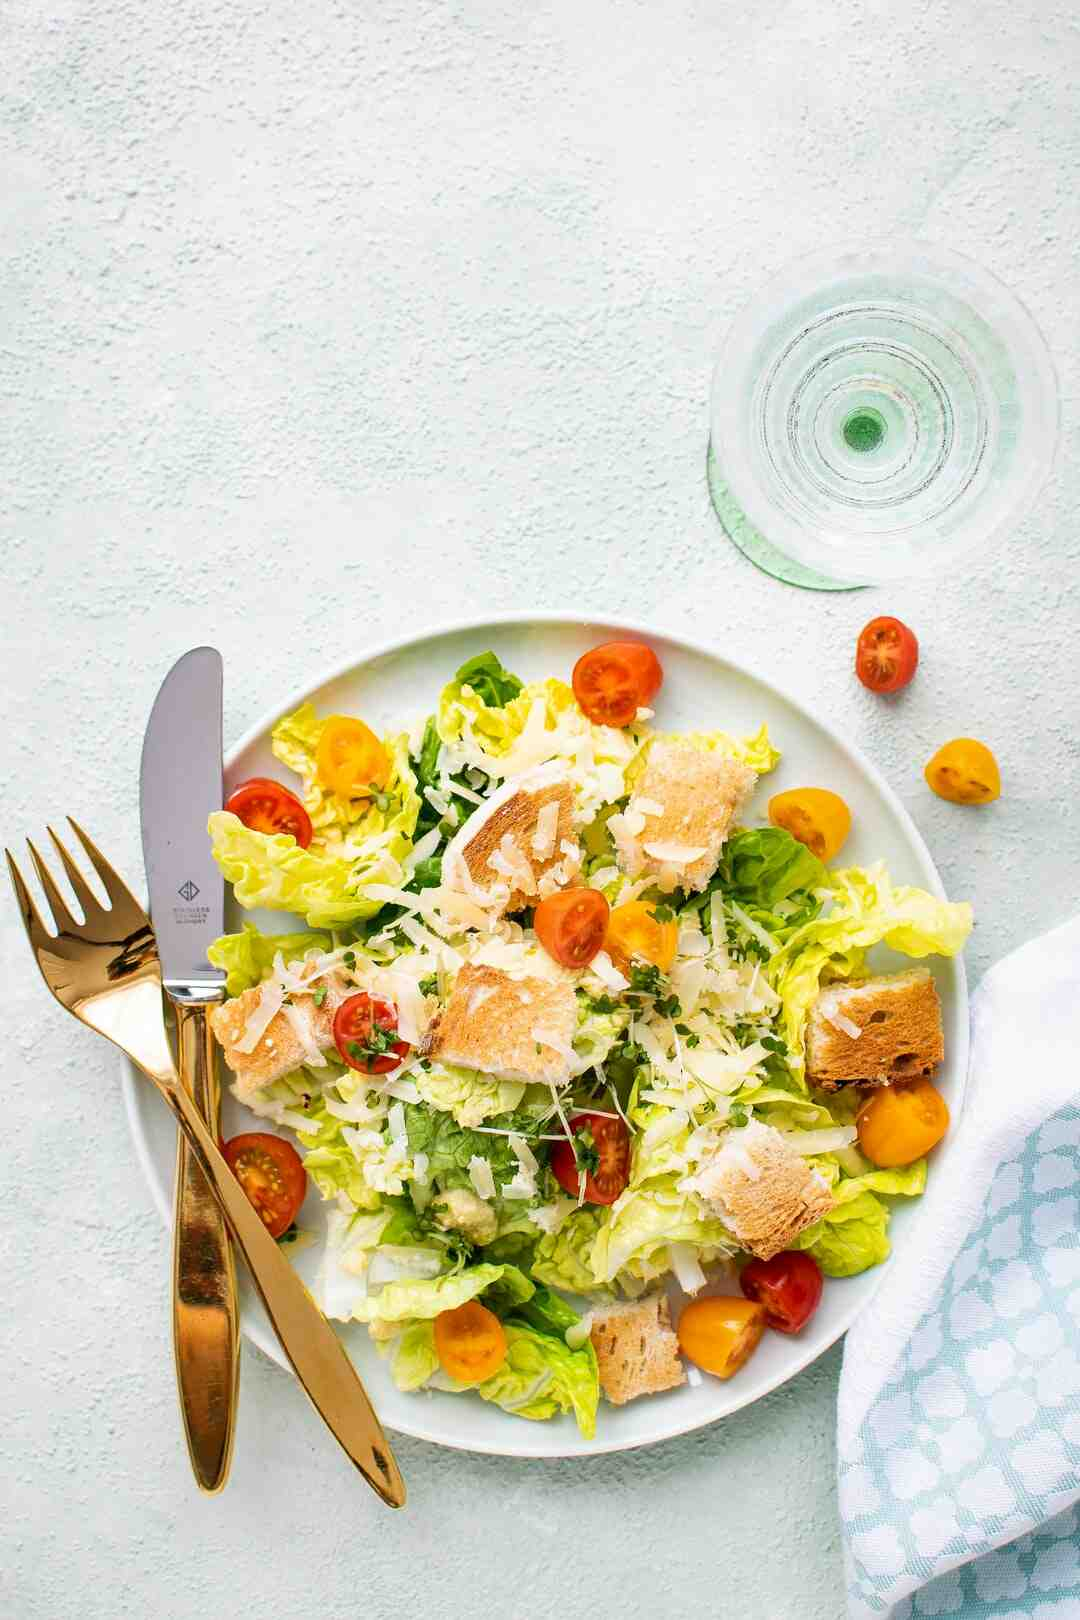 Quand repiquer les salades avec la lune 2021 ?